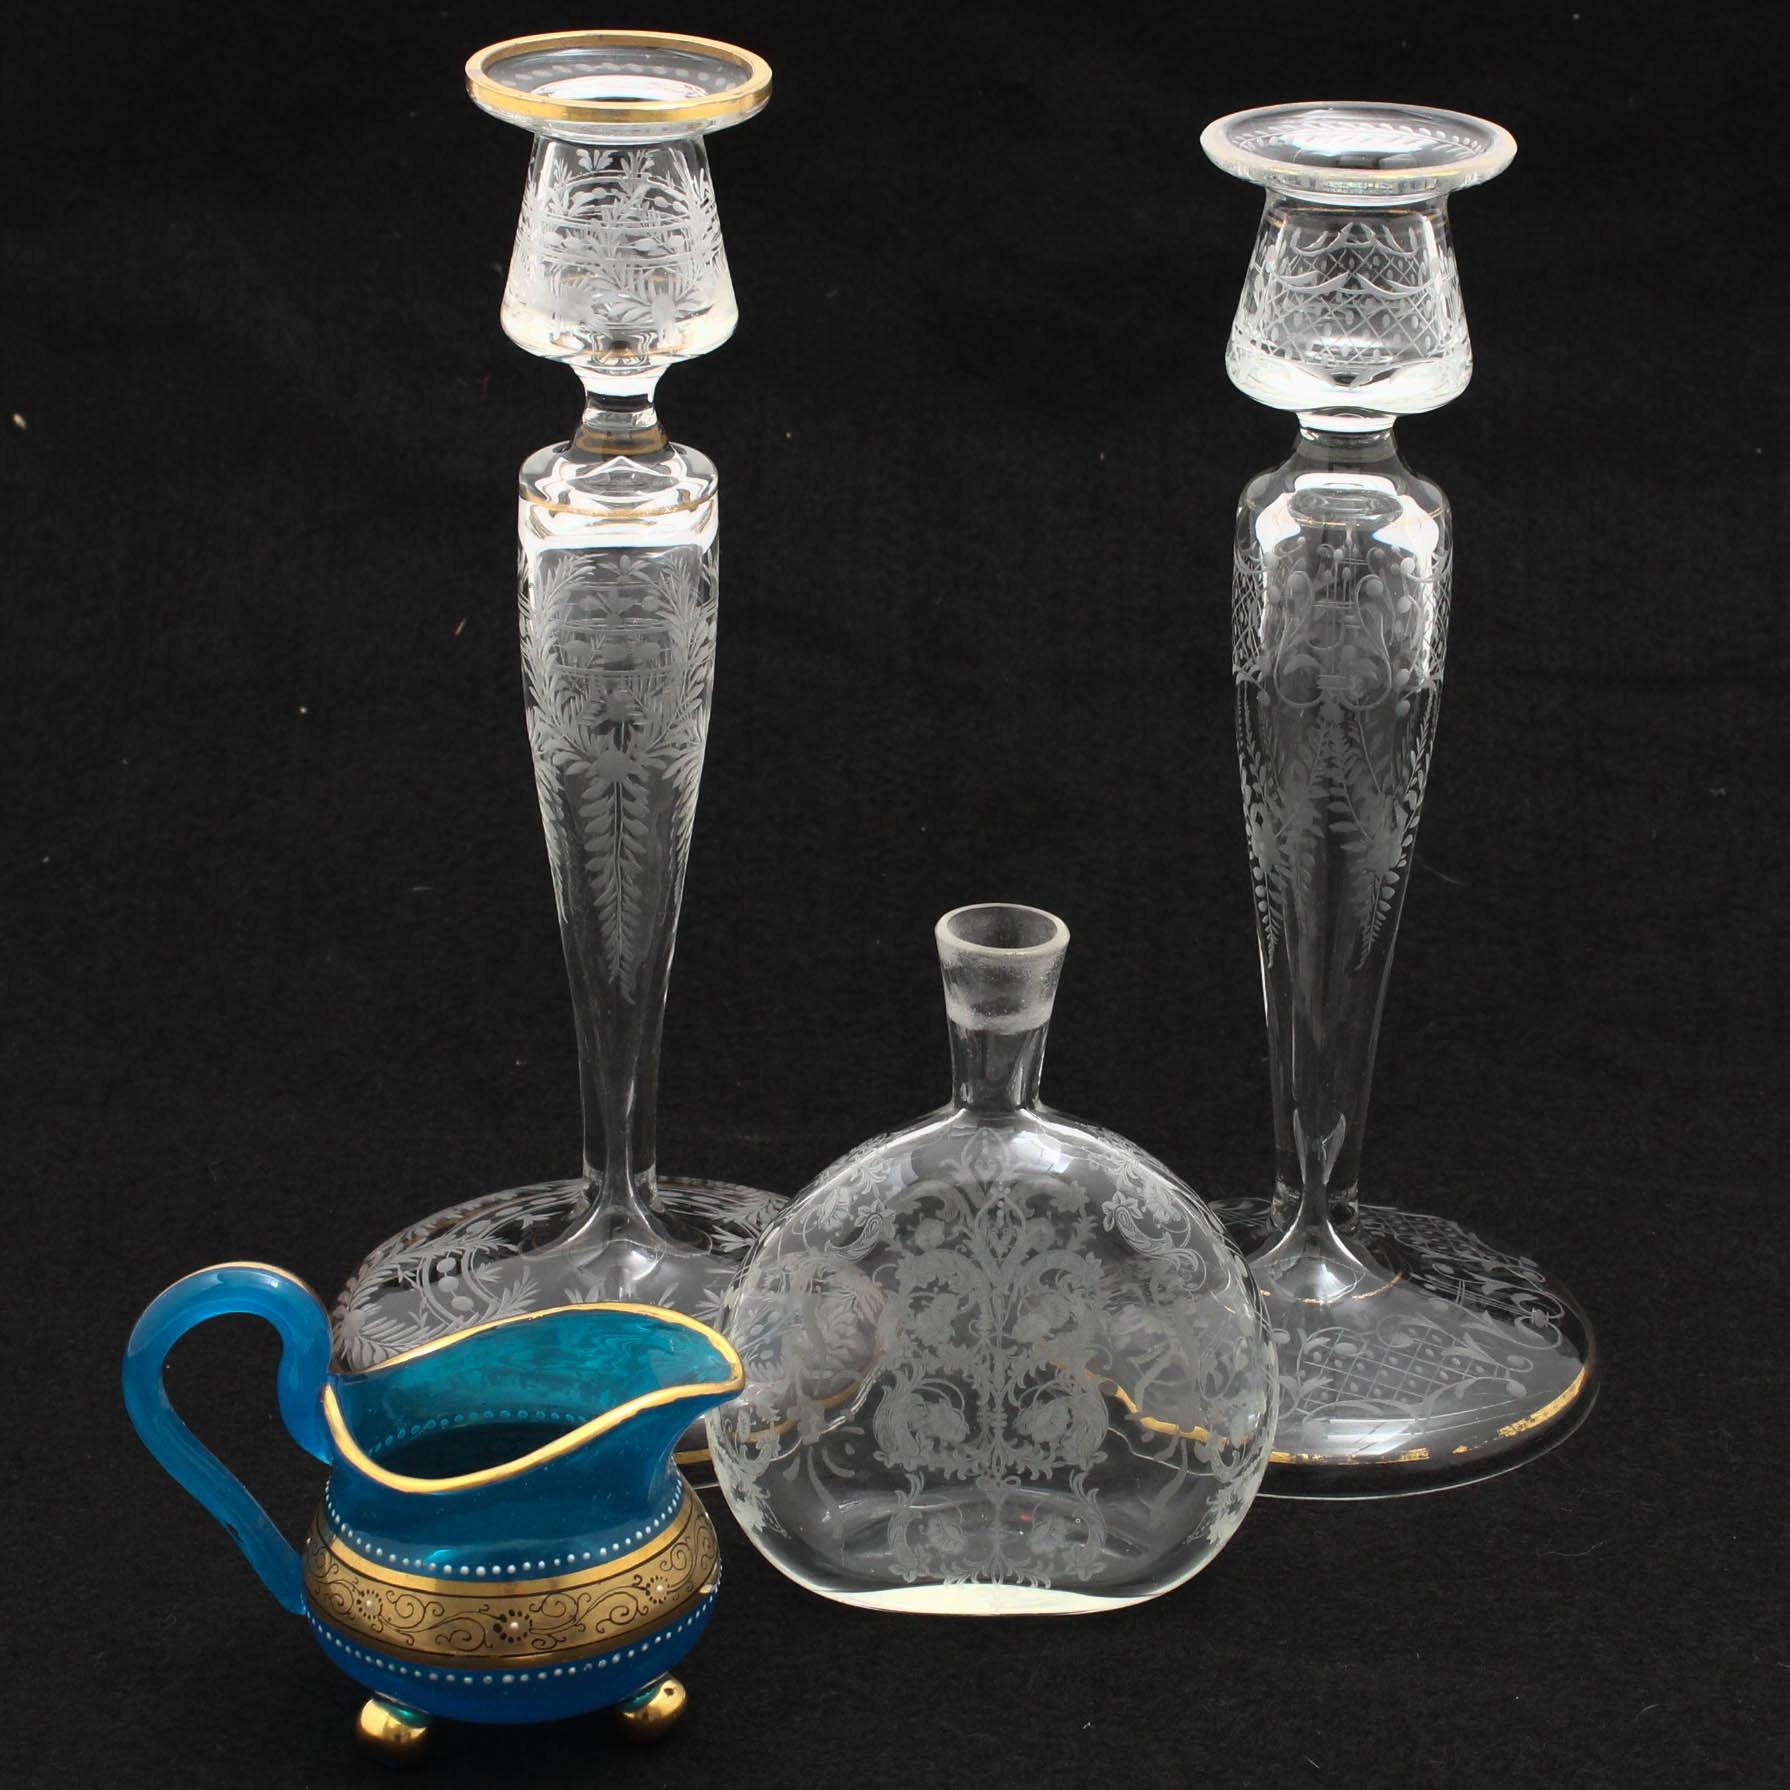 Etched Decorative Glassware